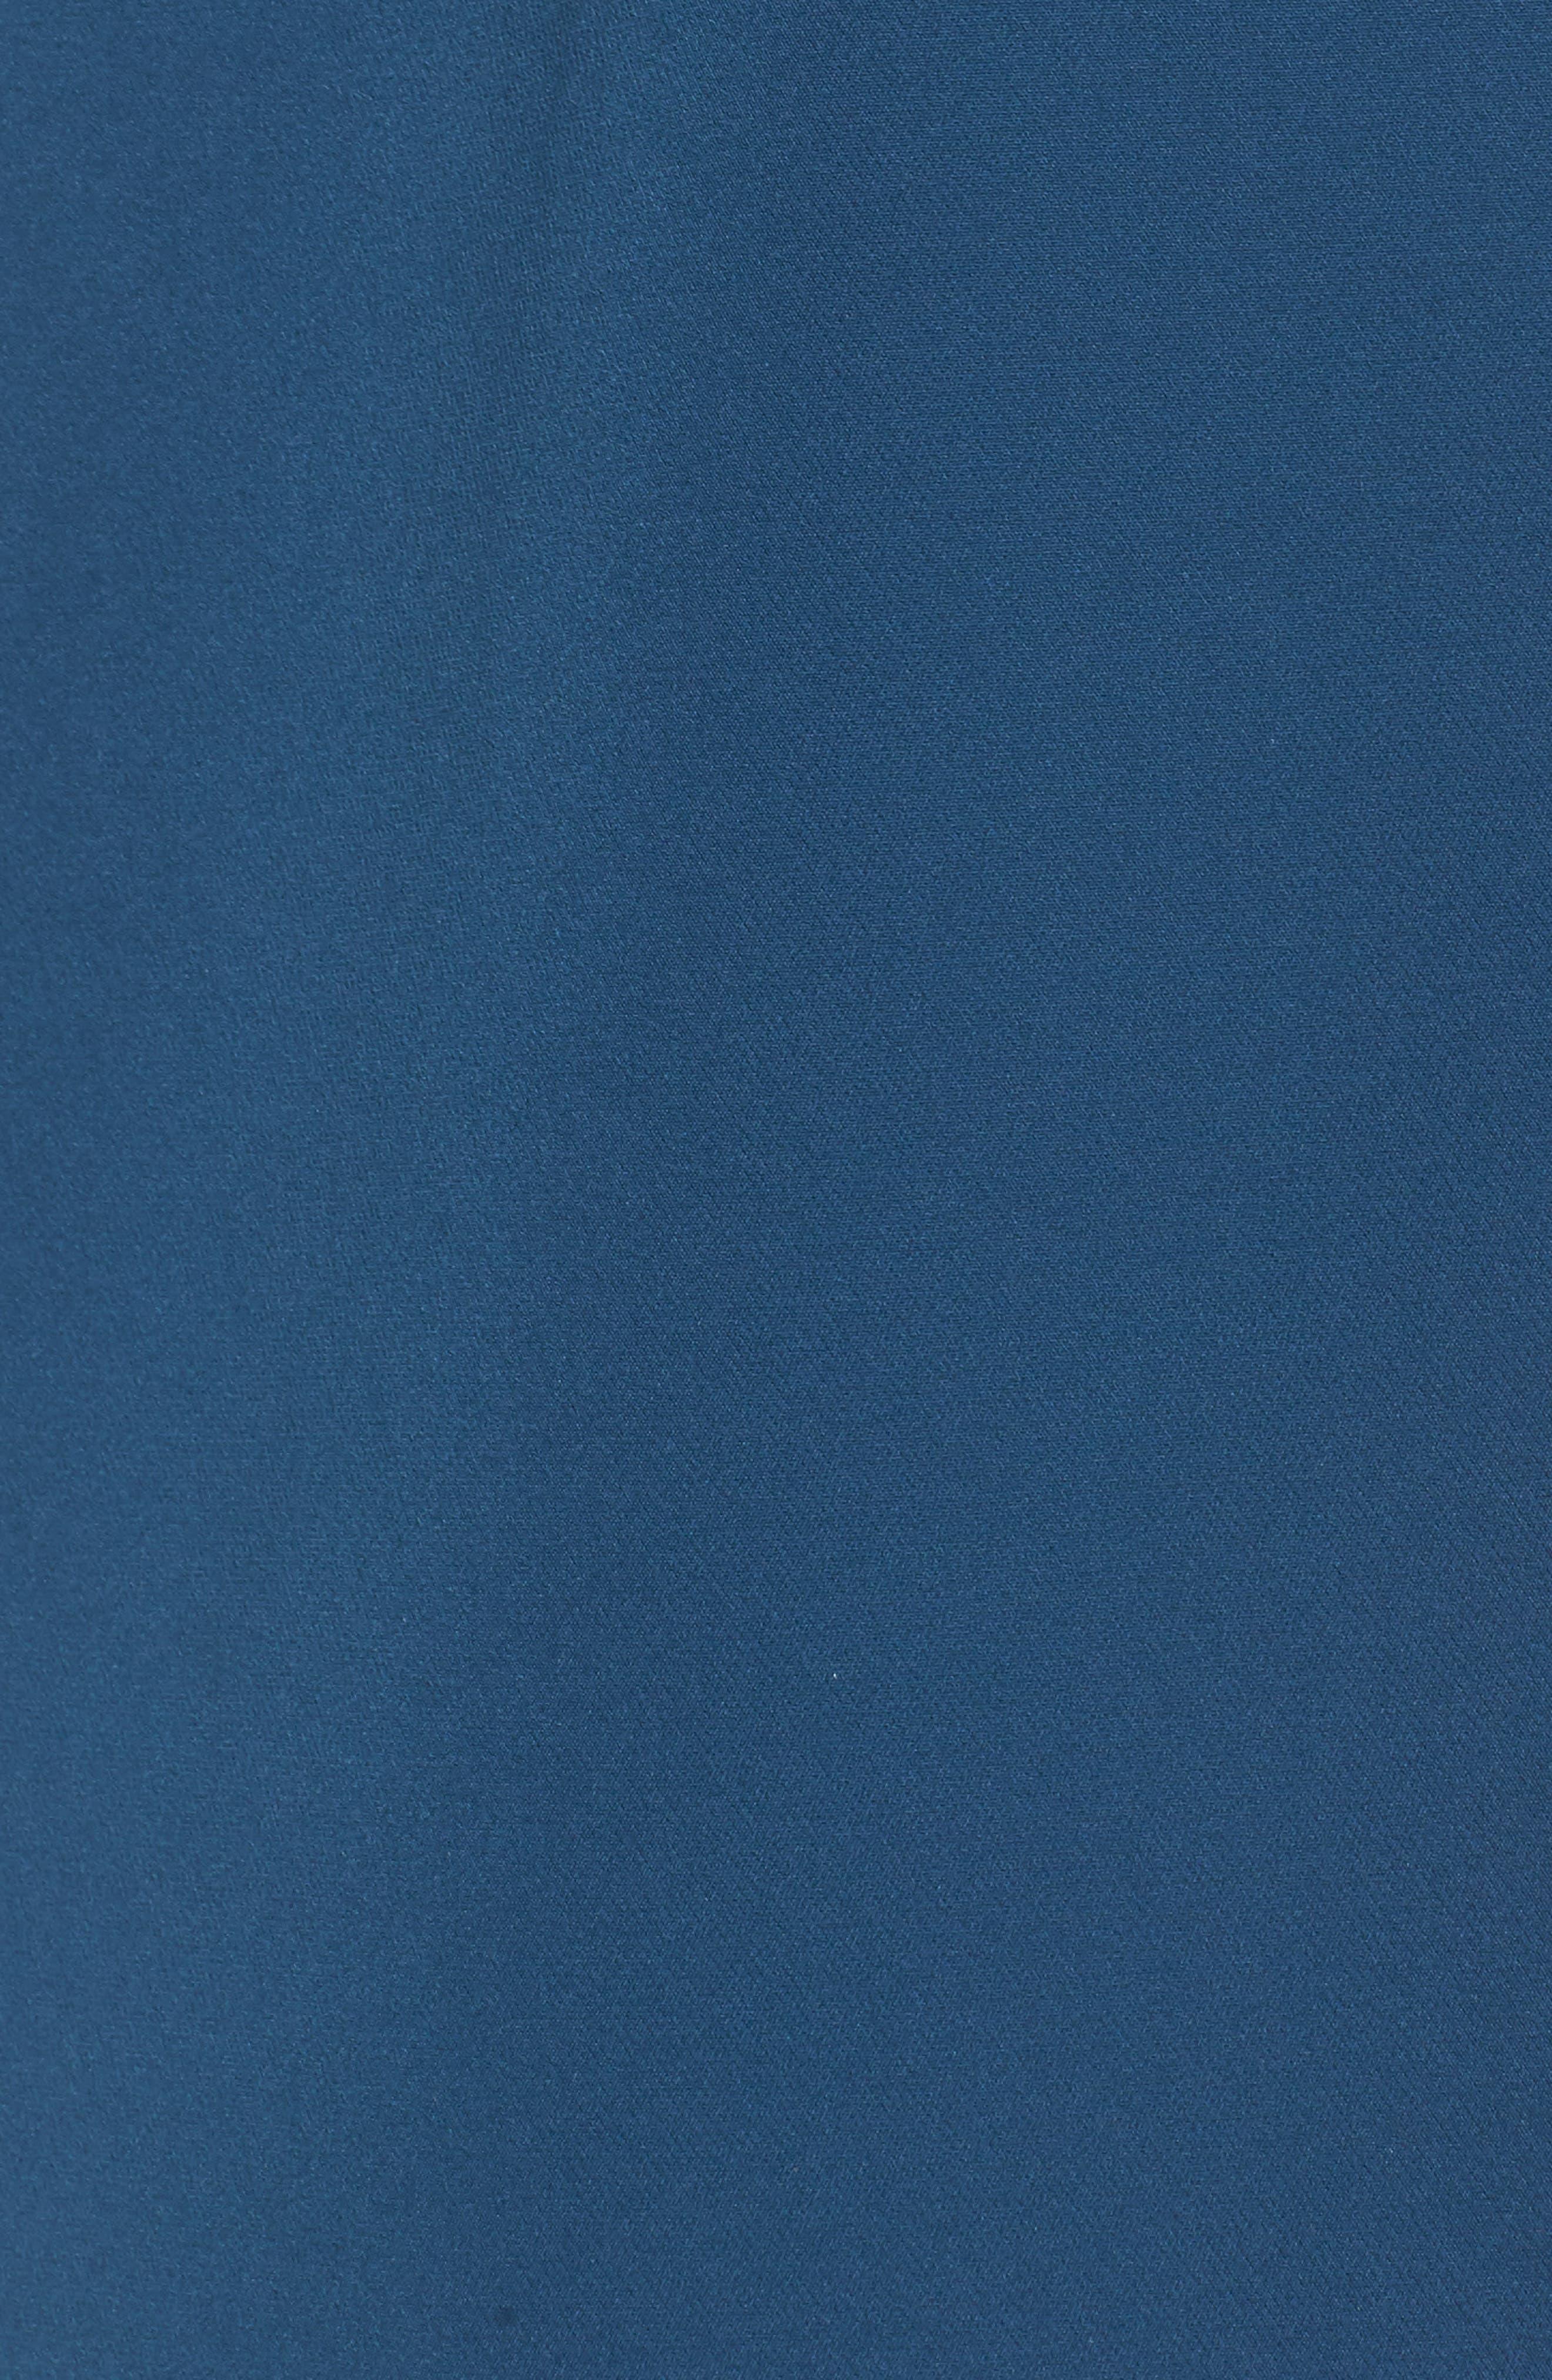 Ruffle Crepe A-Line Dress,                             Alternate thumbnail 6, color,                             450